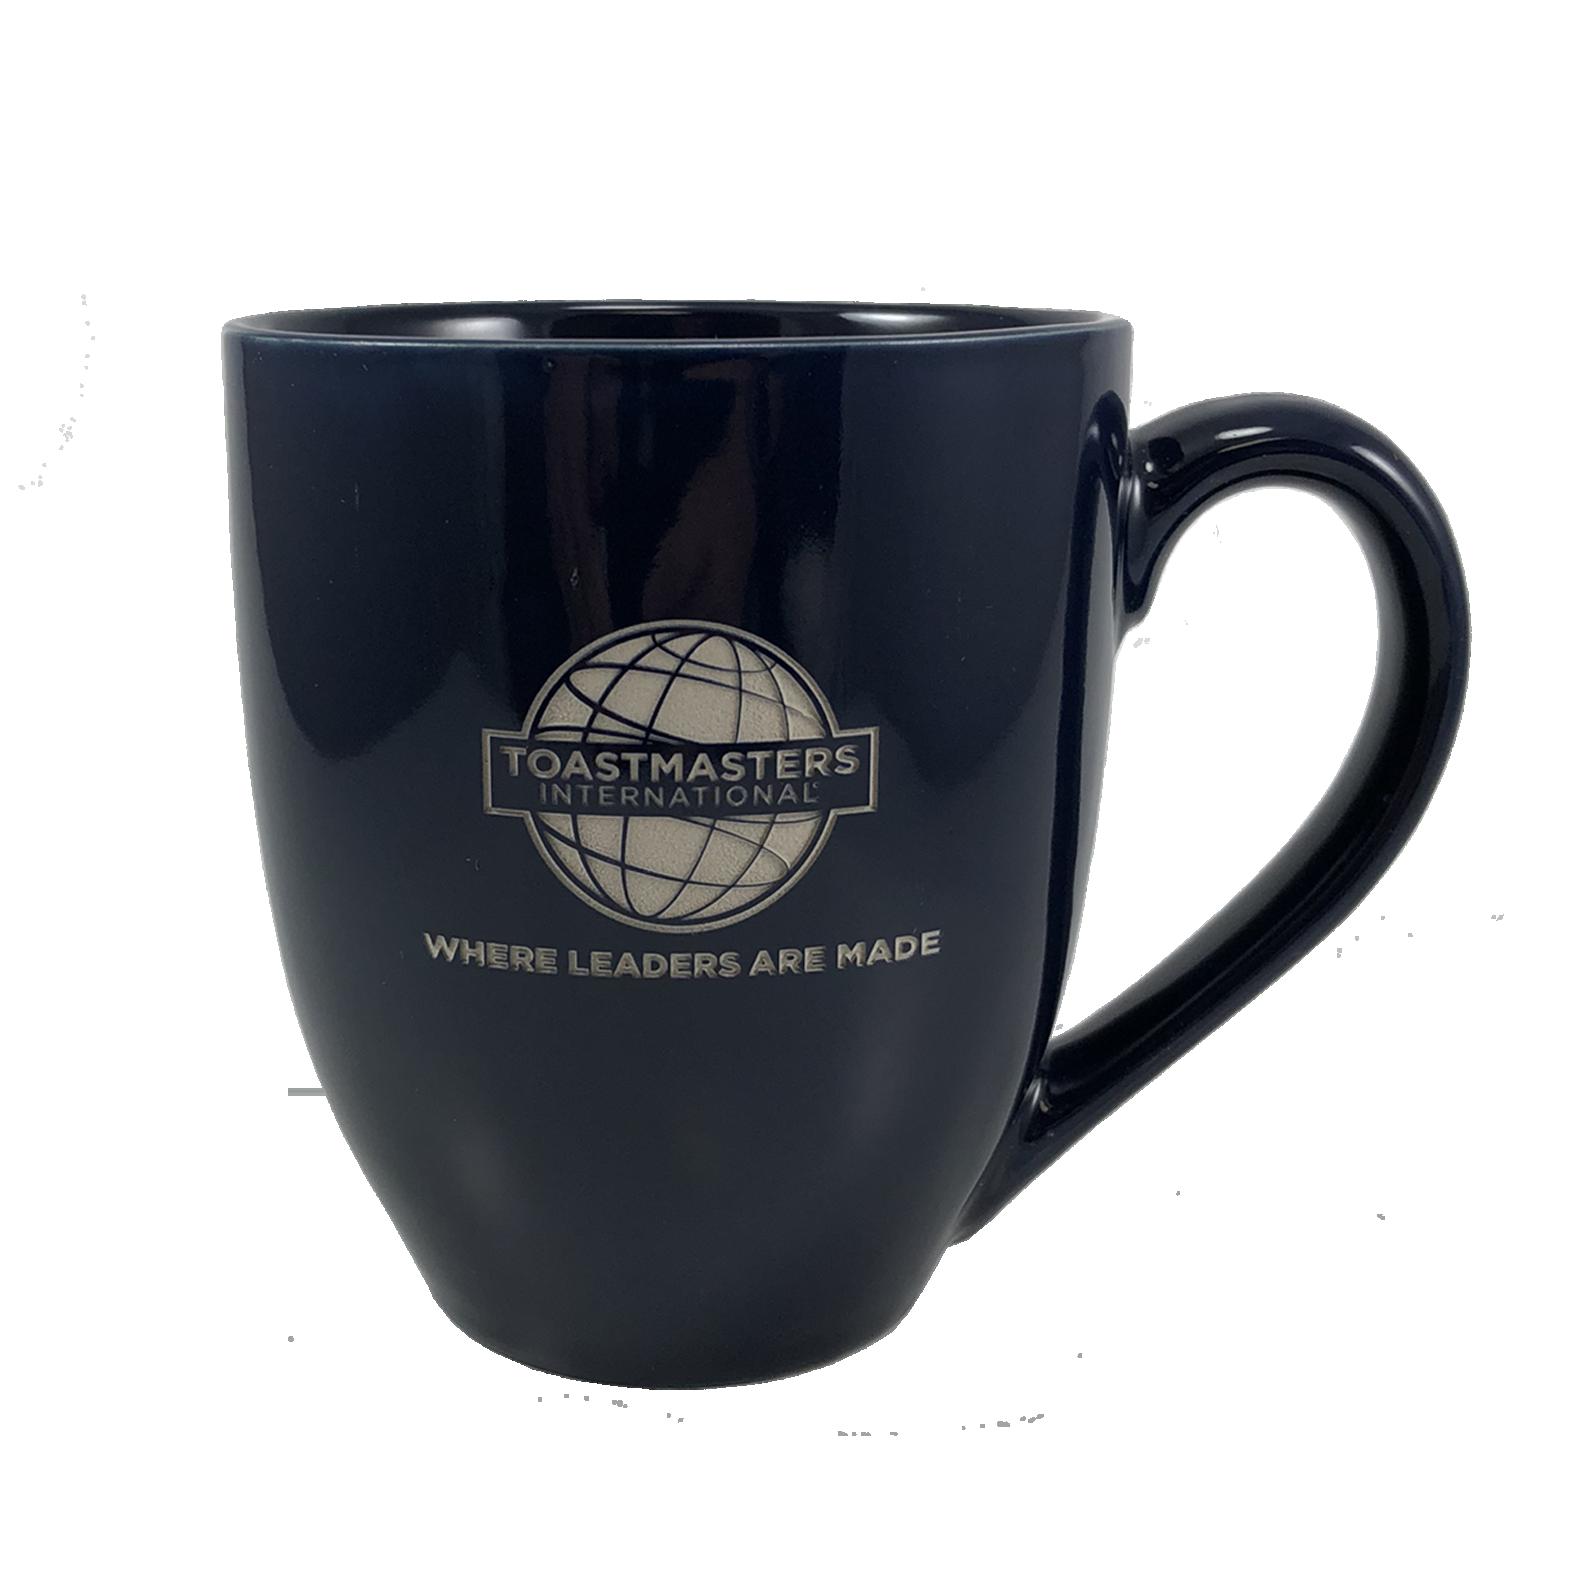 Etched Ceramic Mug